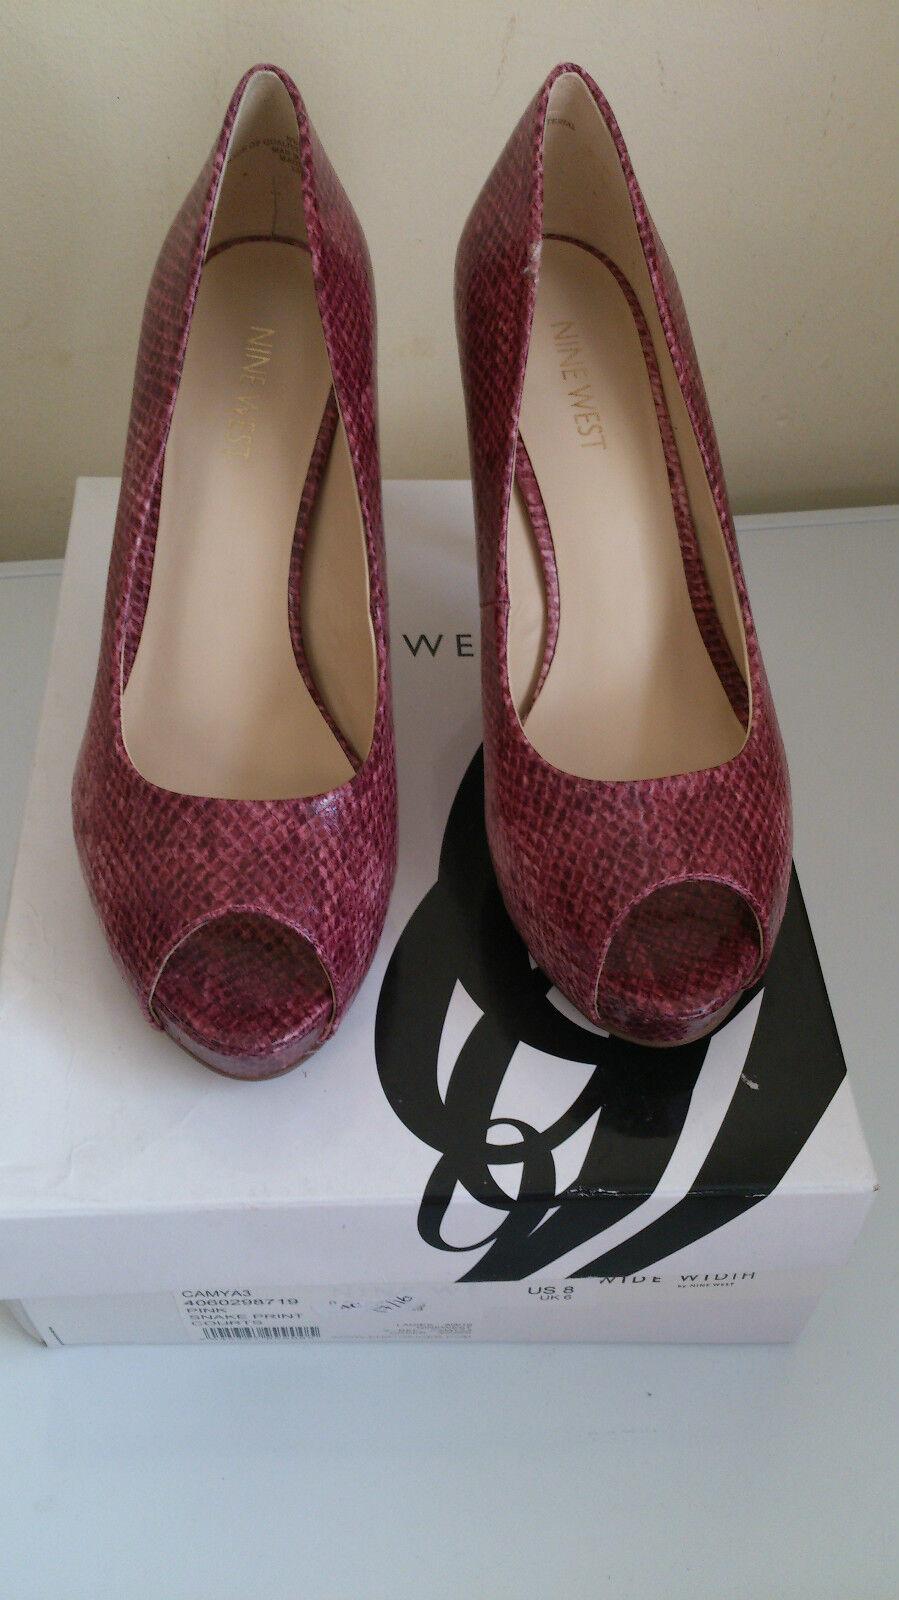 Scarpe di Pelle di Pecora Pecora di ninewest 825337